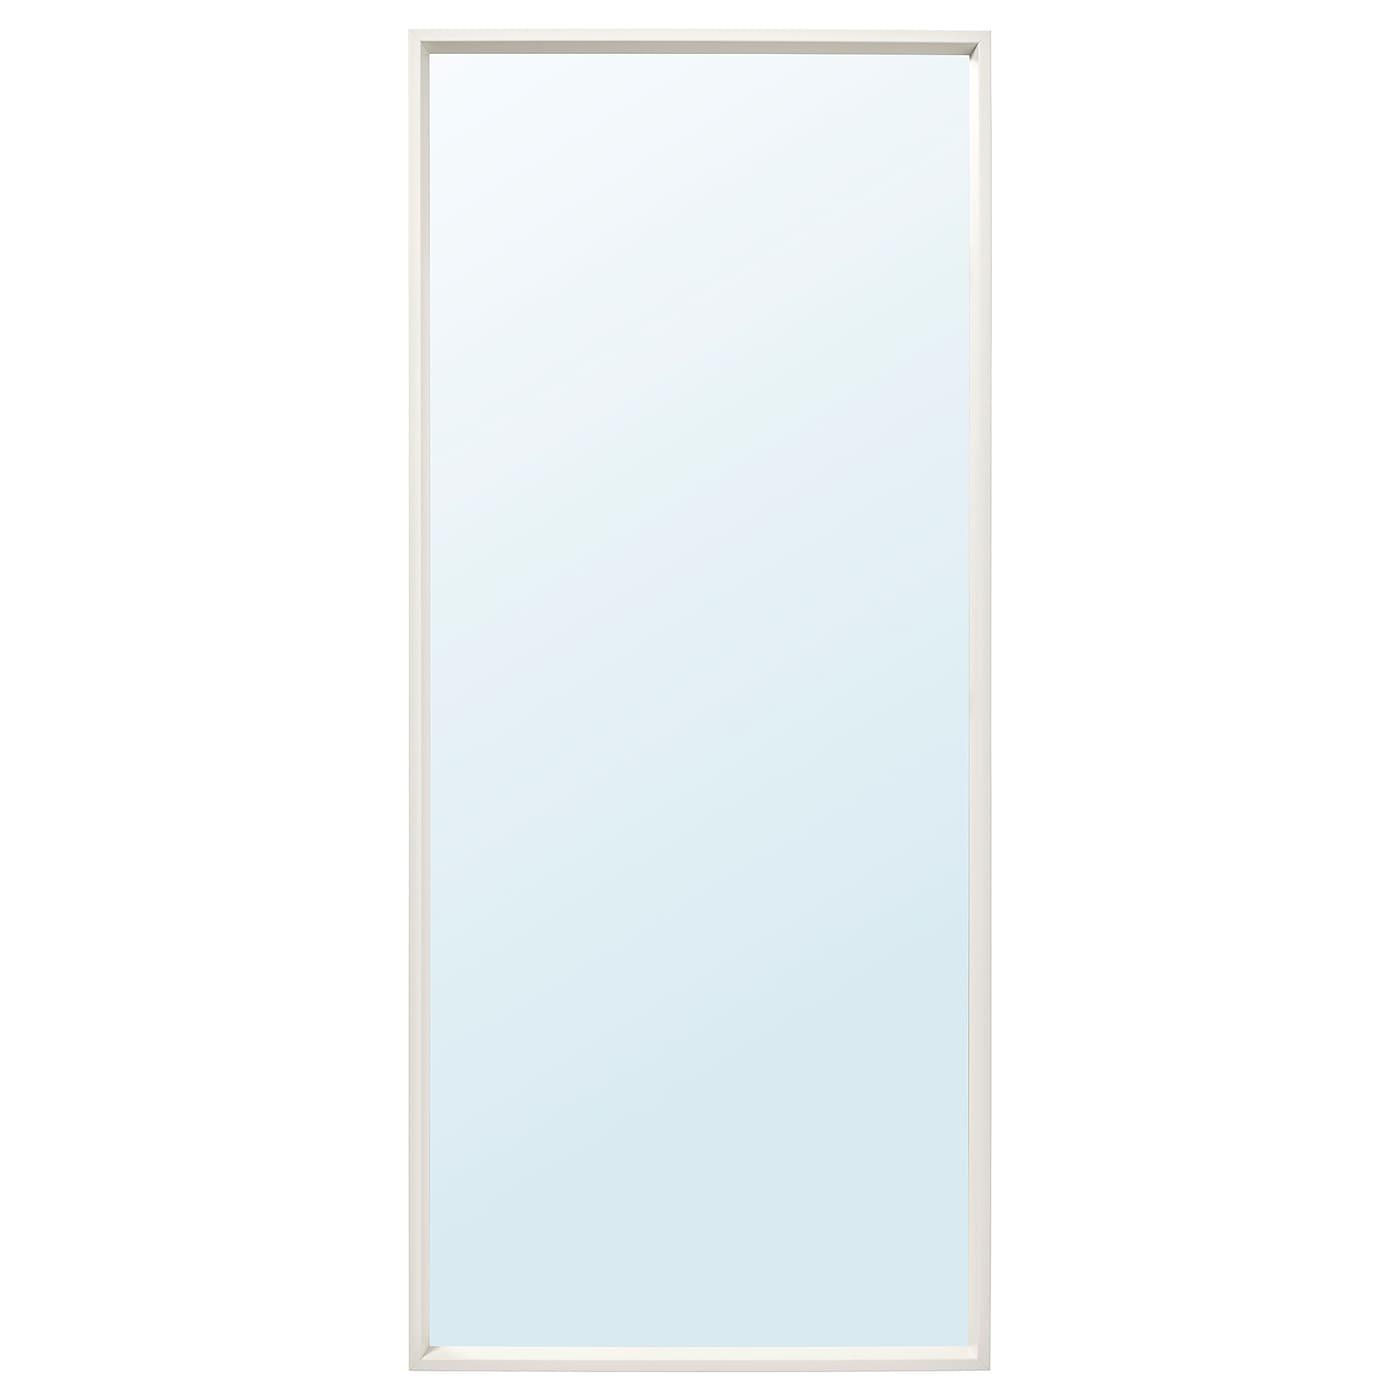 NISSEDAL Spiegel - weiß 8x8 cm